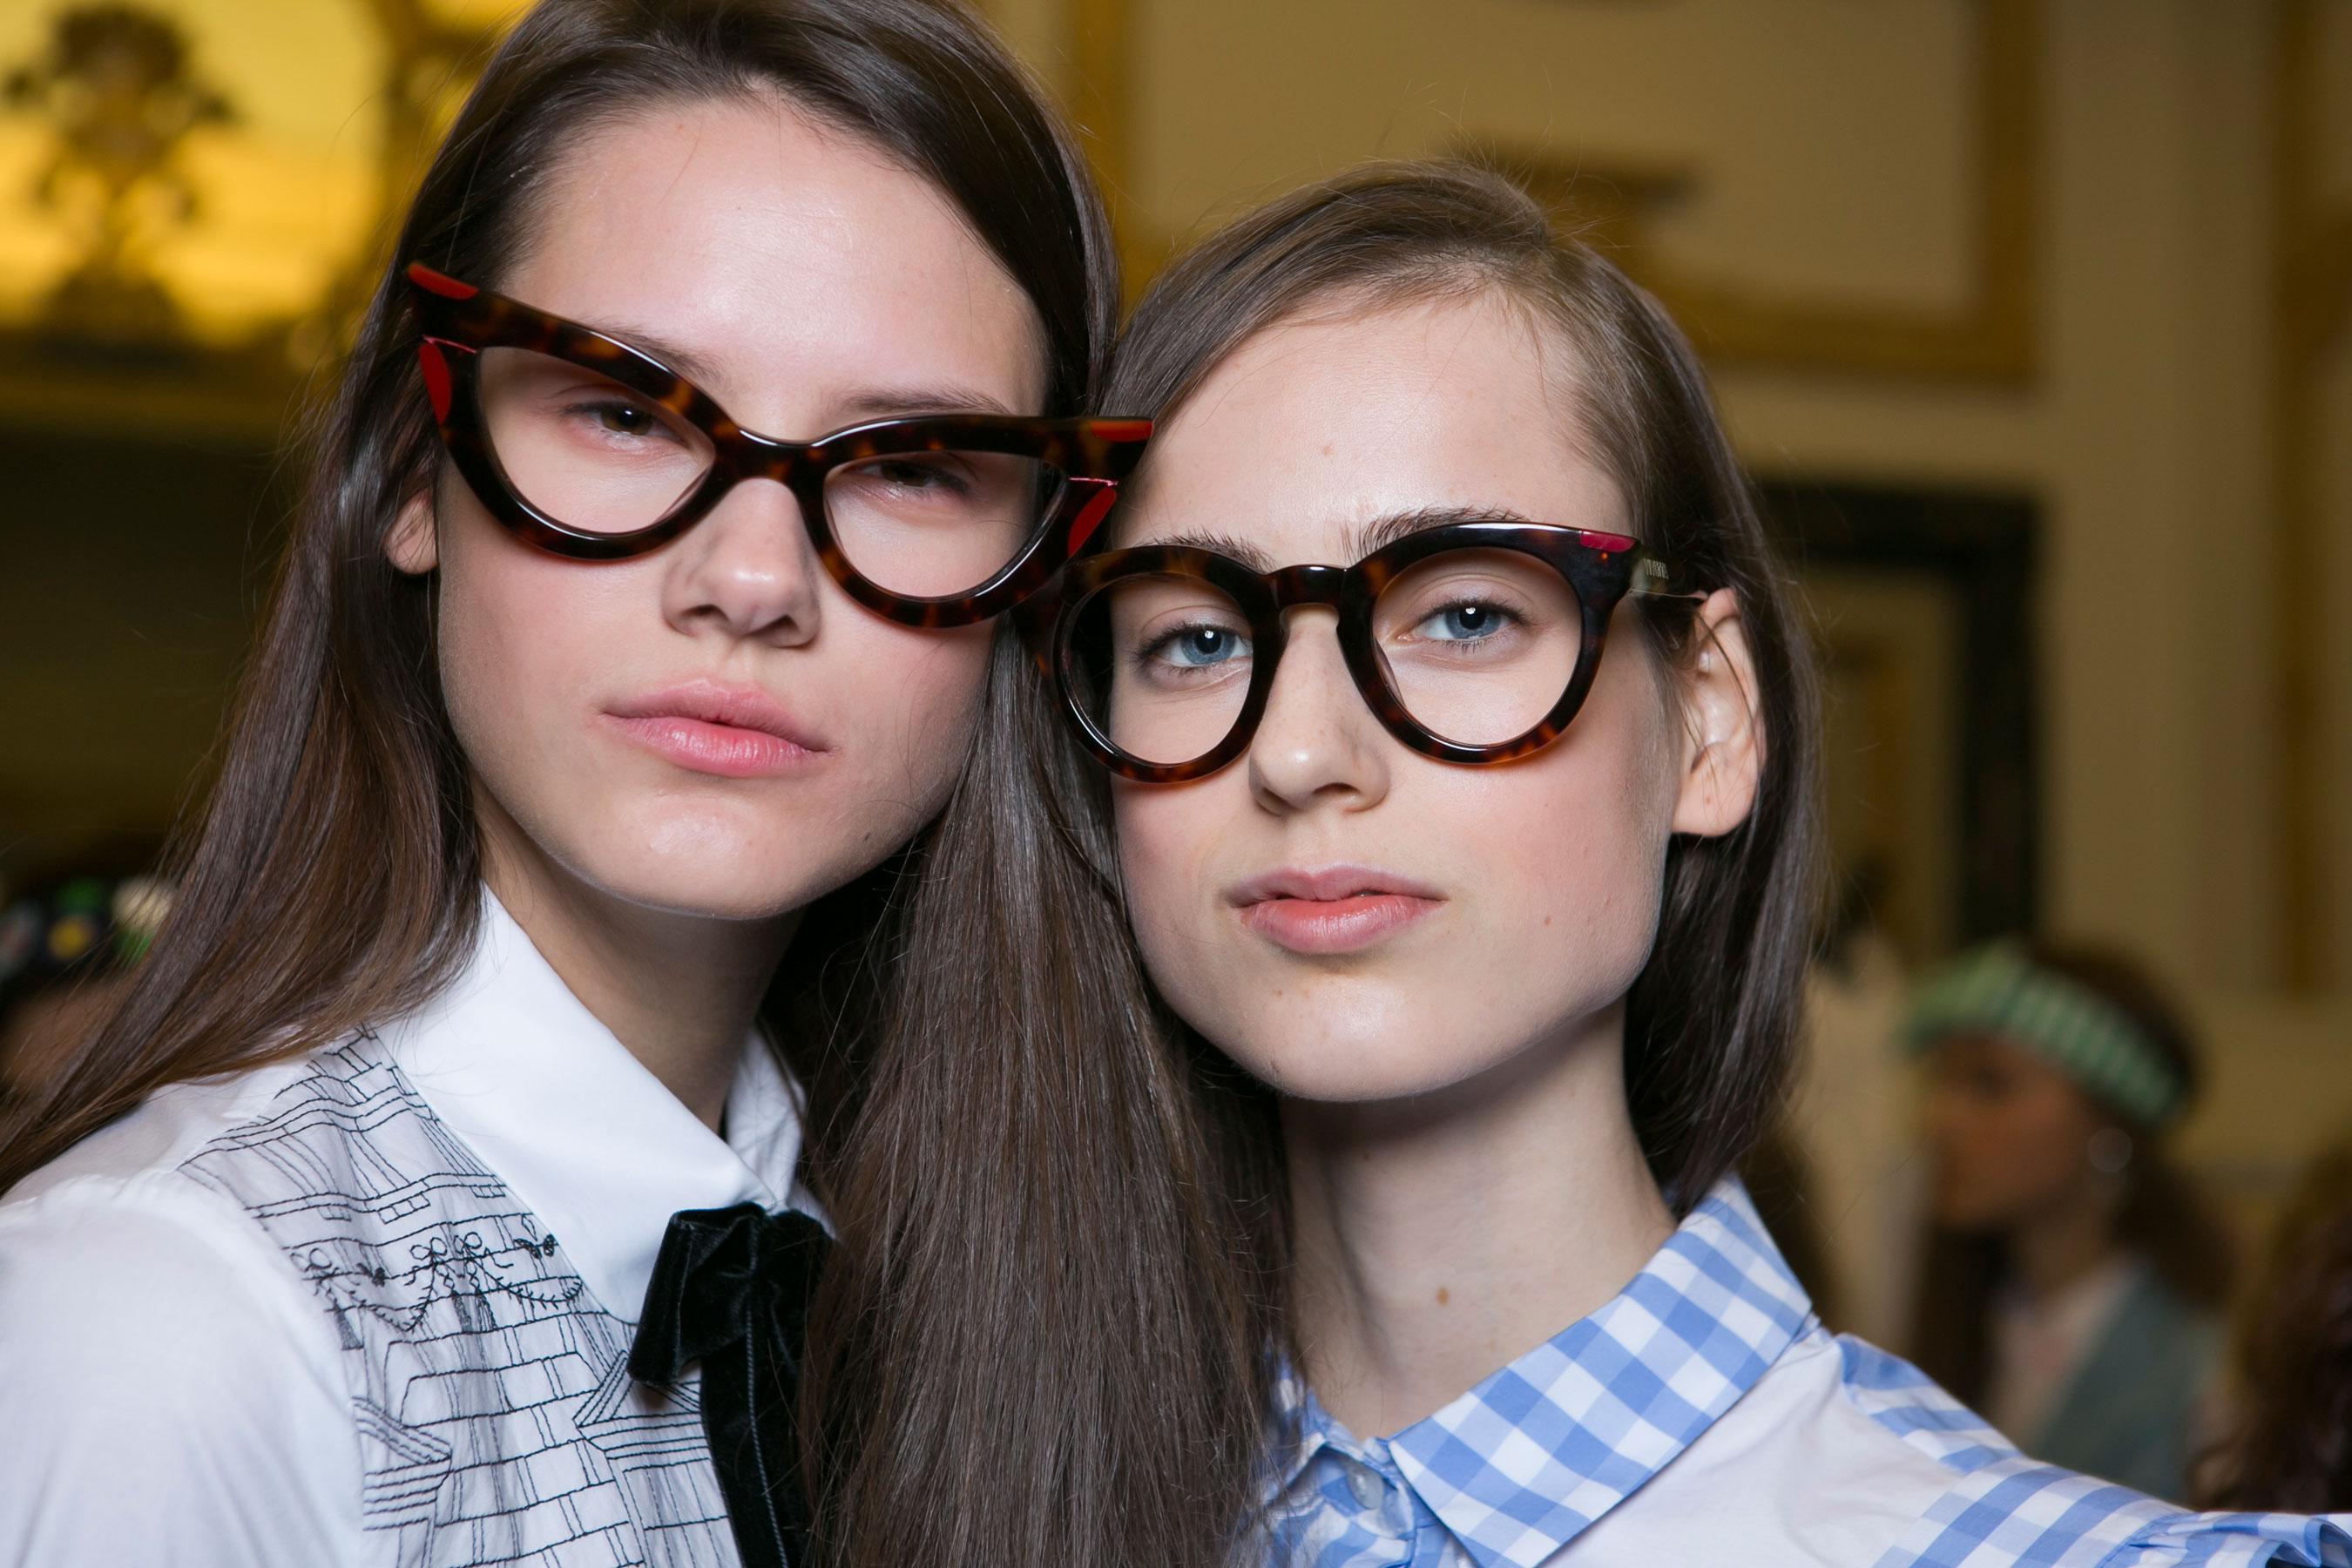 Vivetta-spring-2016-beauty-fashion-show-the-impression-15